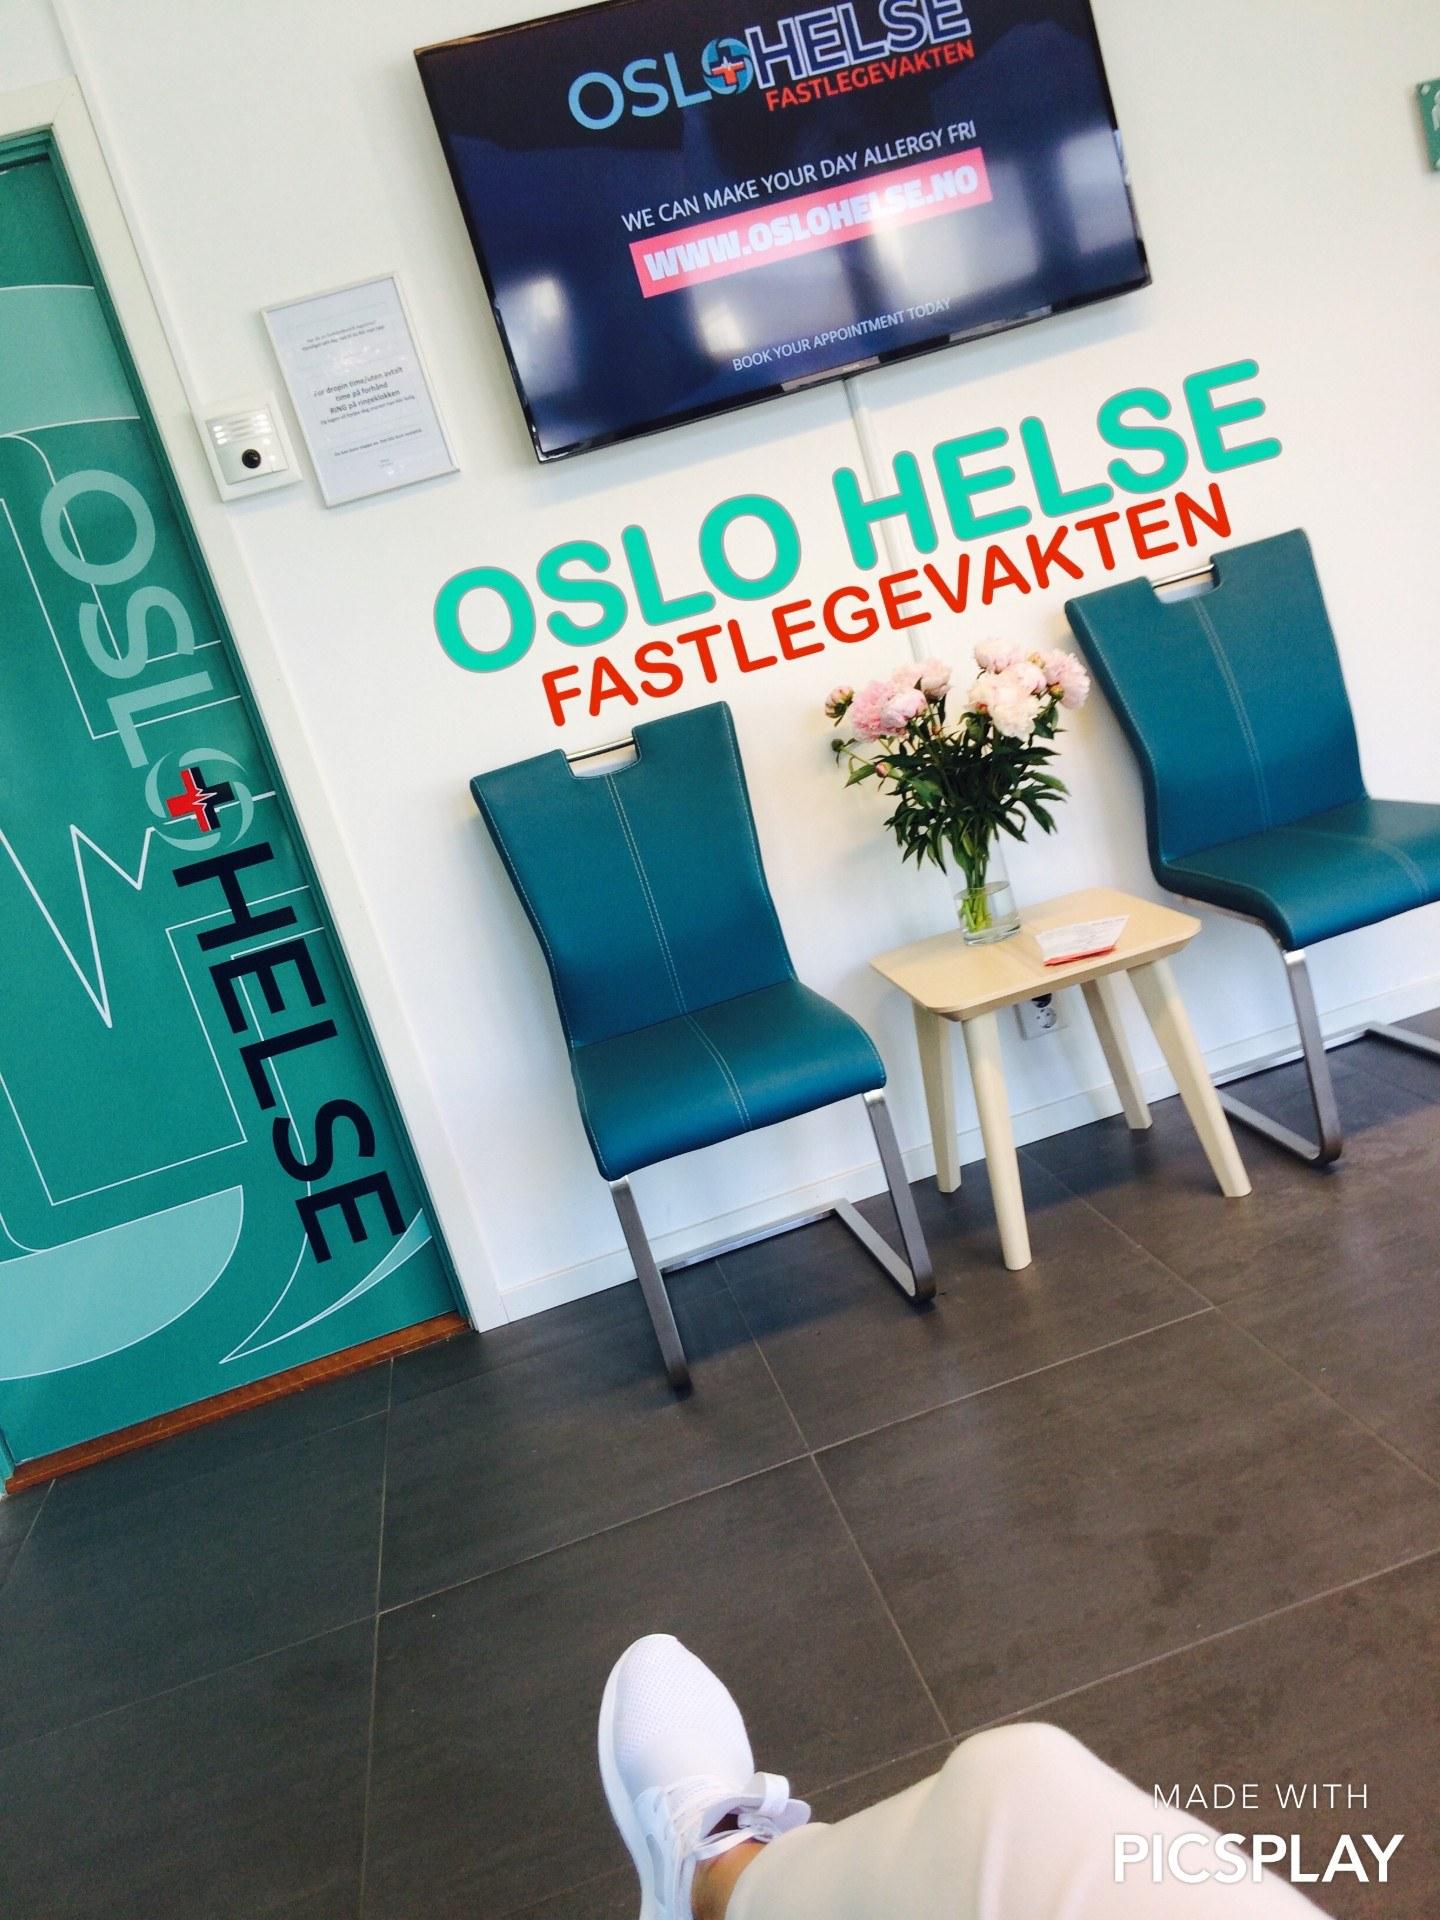 Oslo Helse waiting room